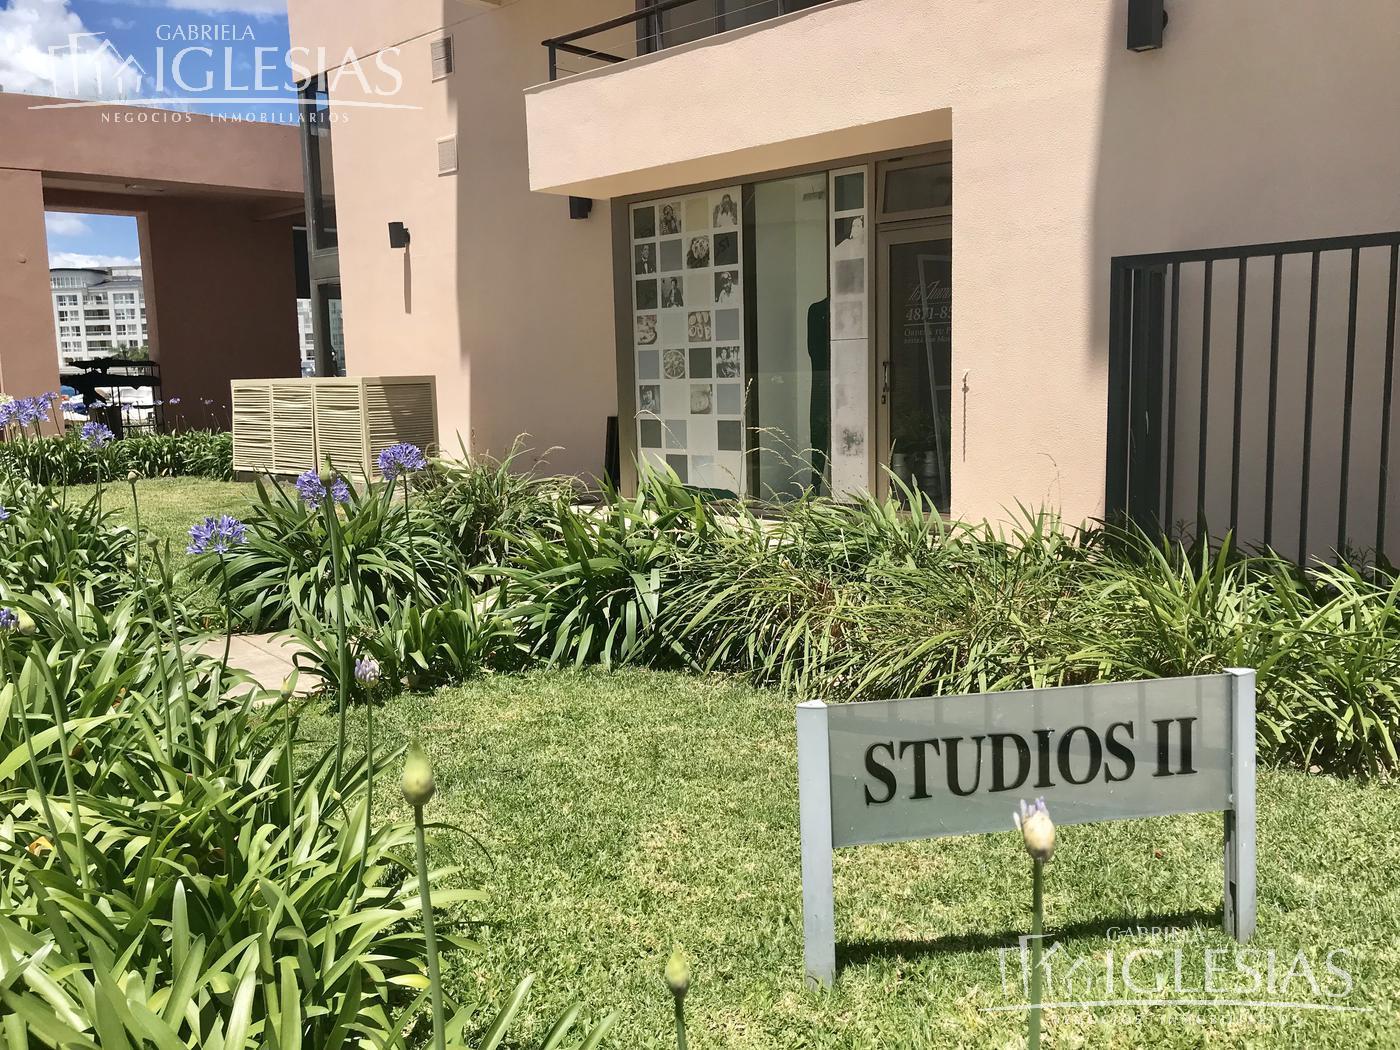 Departamento en Alquiler en Nordelta Paseo de la Bahia - Studios II a Alquiler - $ 8.000